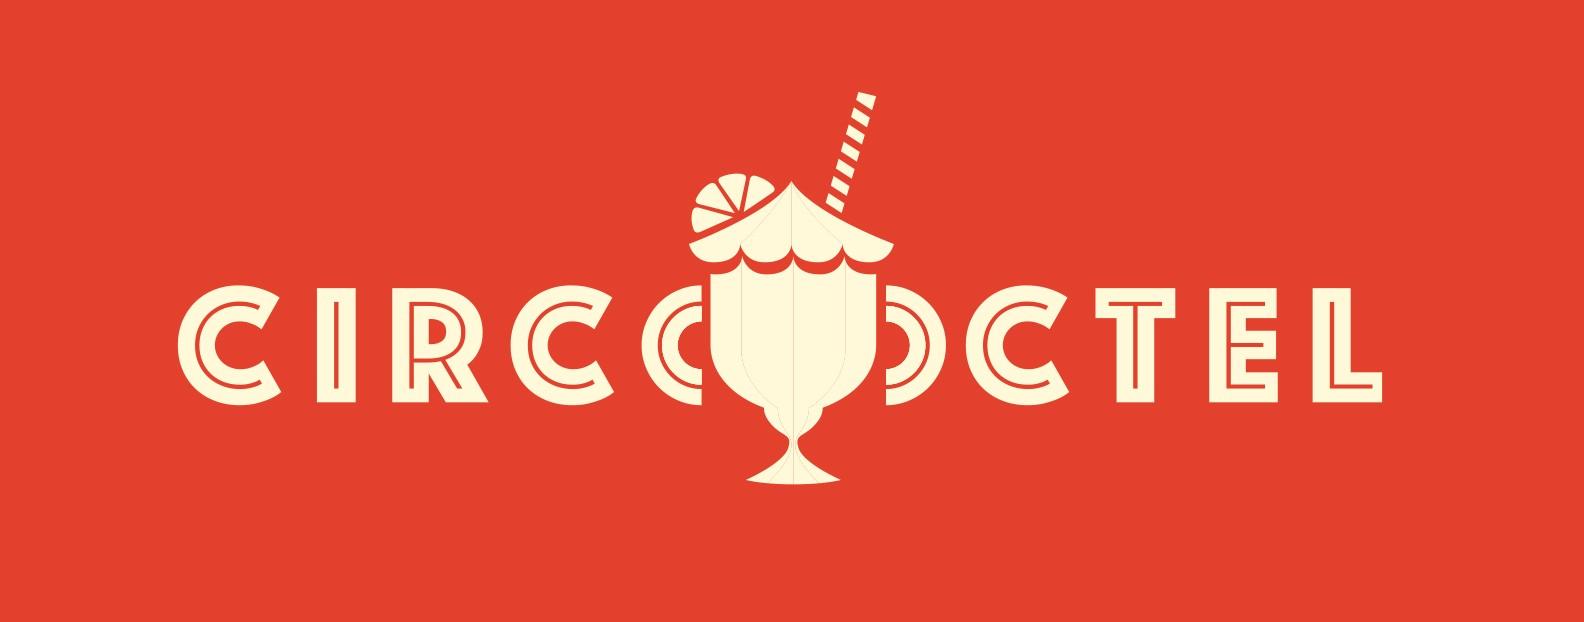 CIRCOCOCTEL